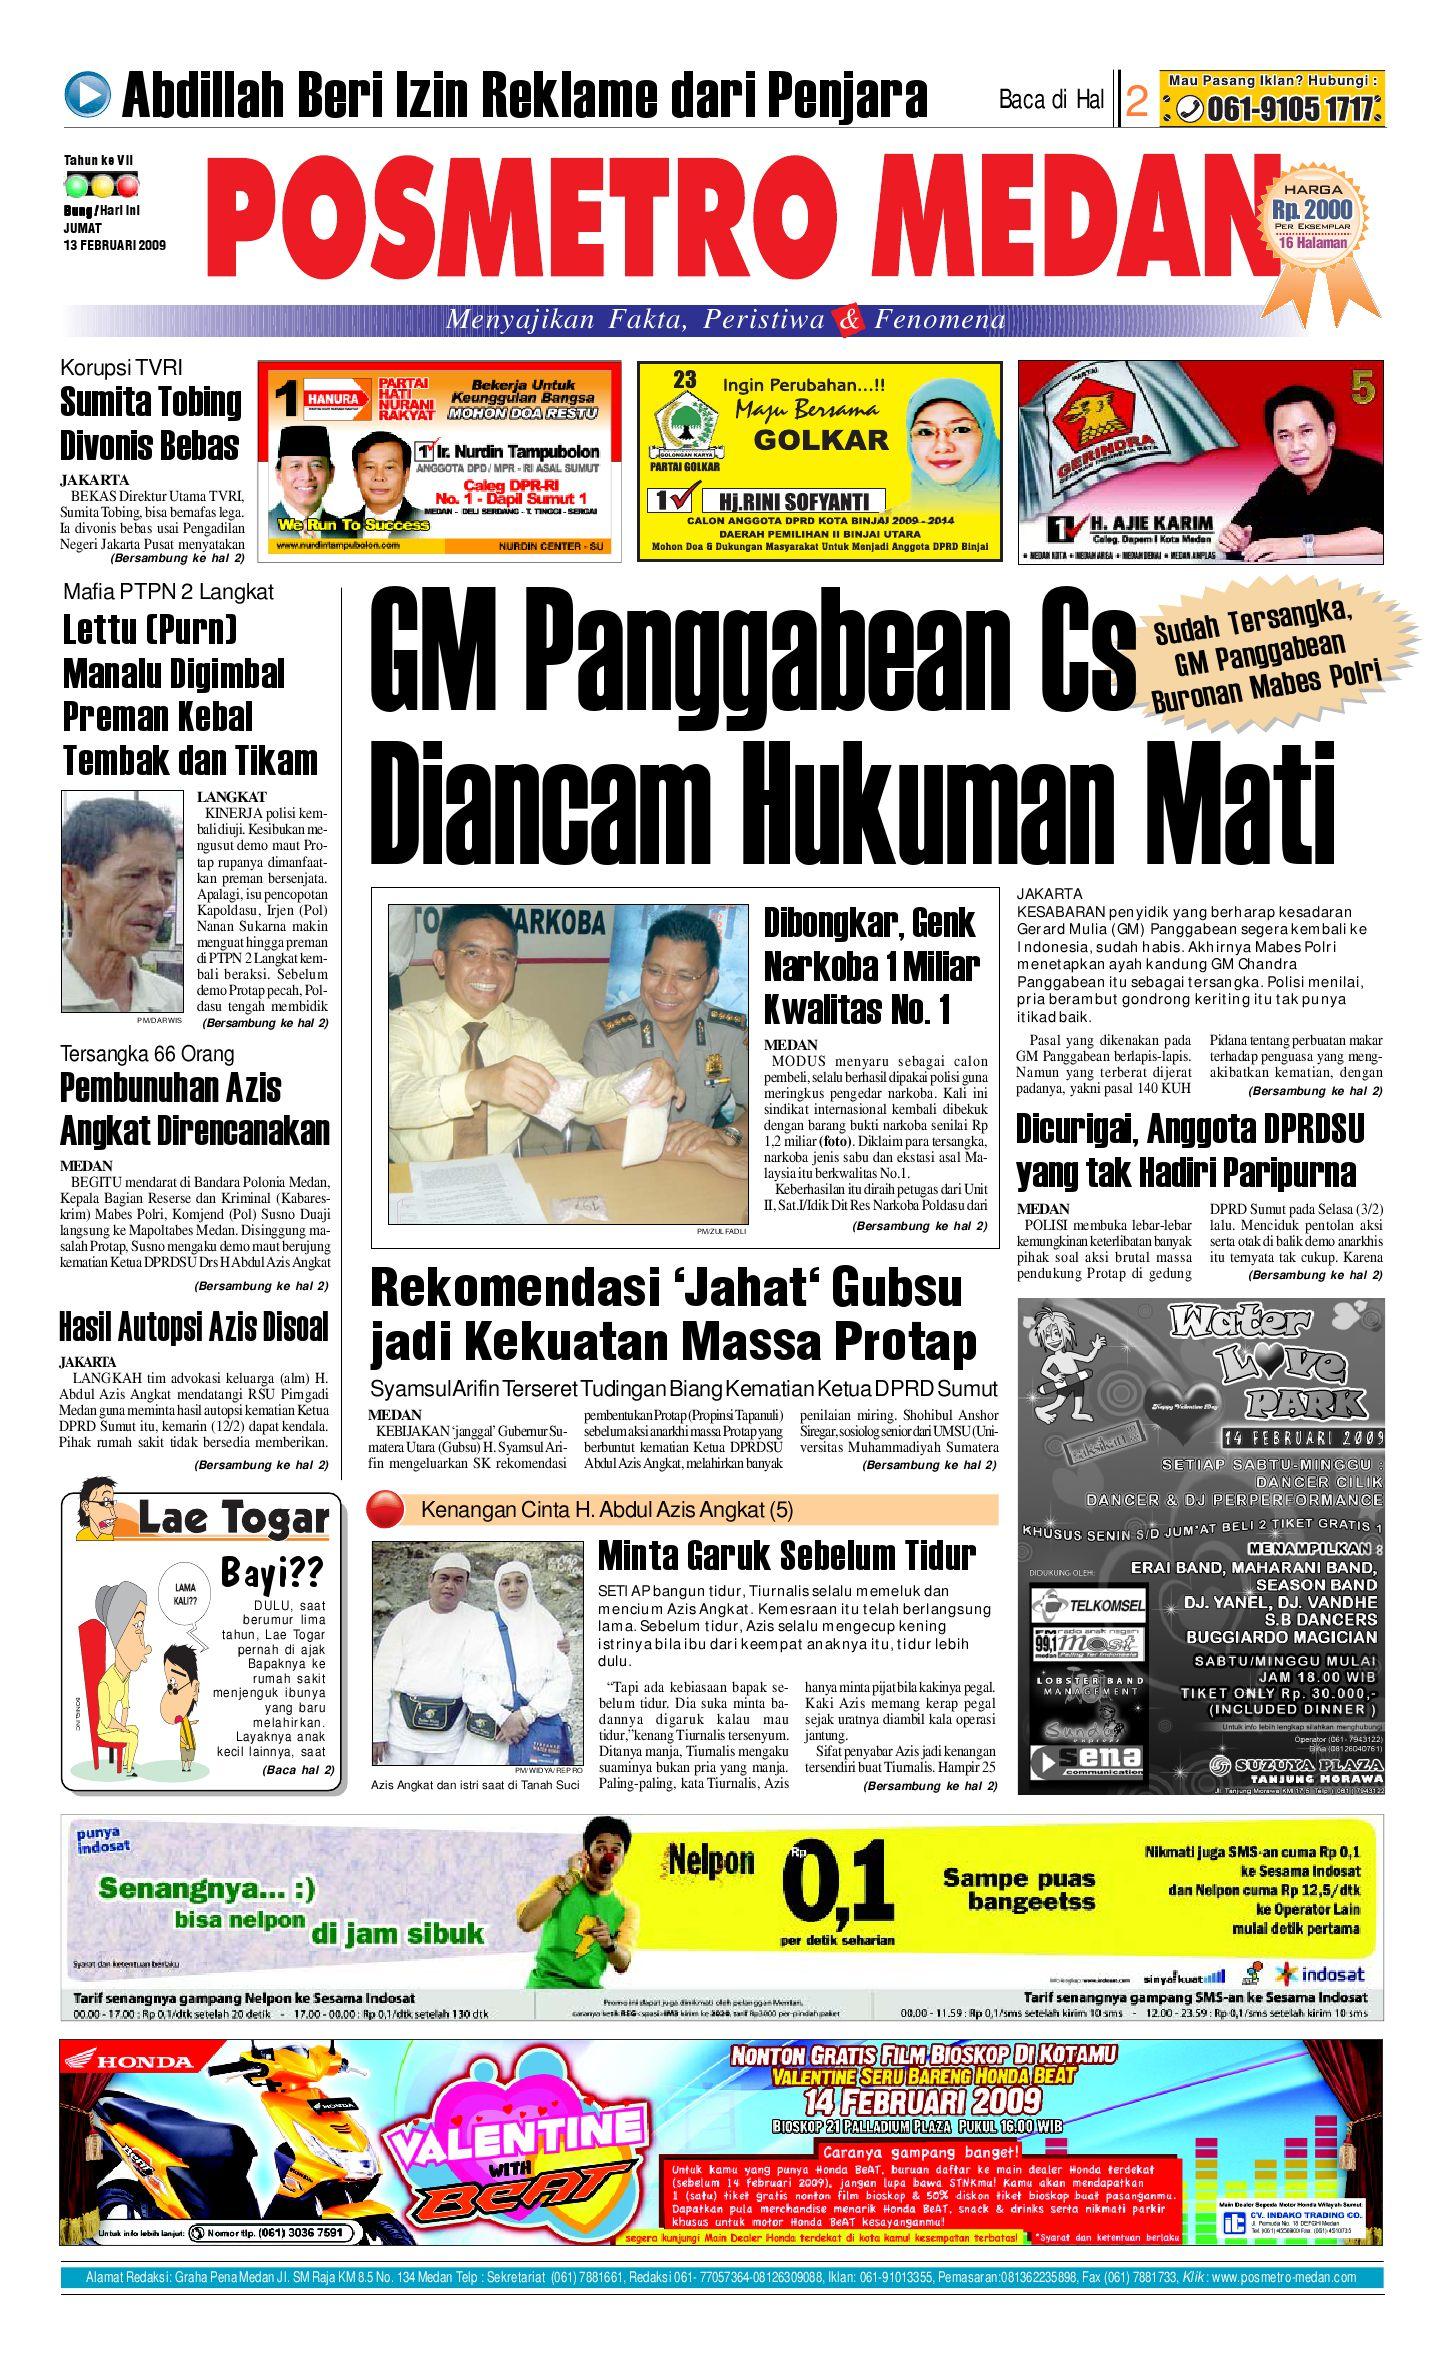 Posmetro Medan By Simon Sinaga Issuu Charger Warna Warni Merk Hasan Sj0048